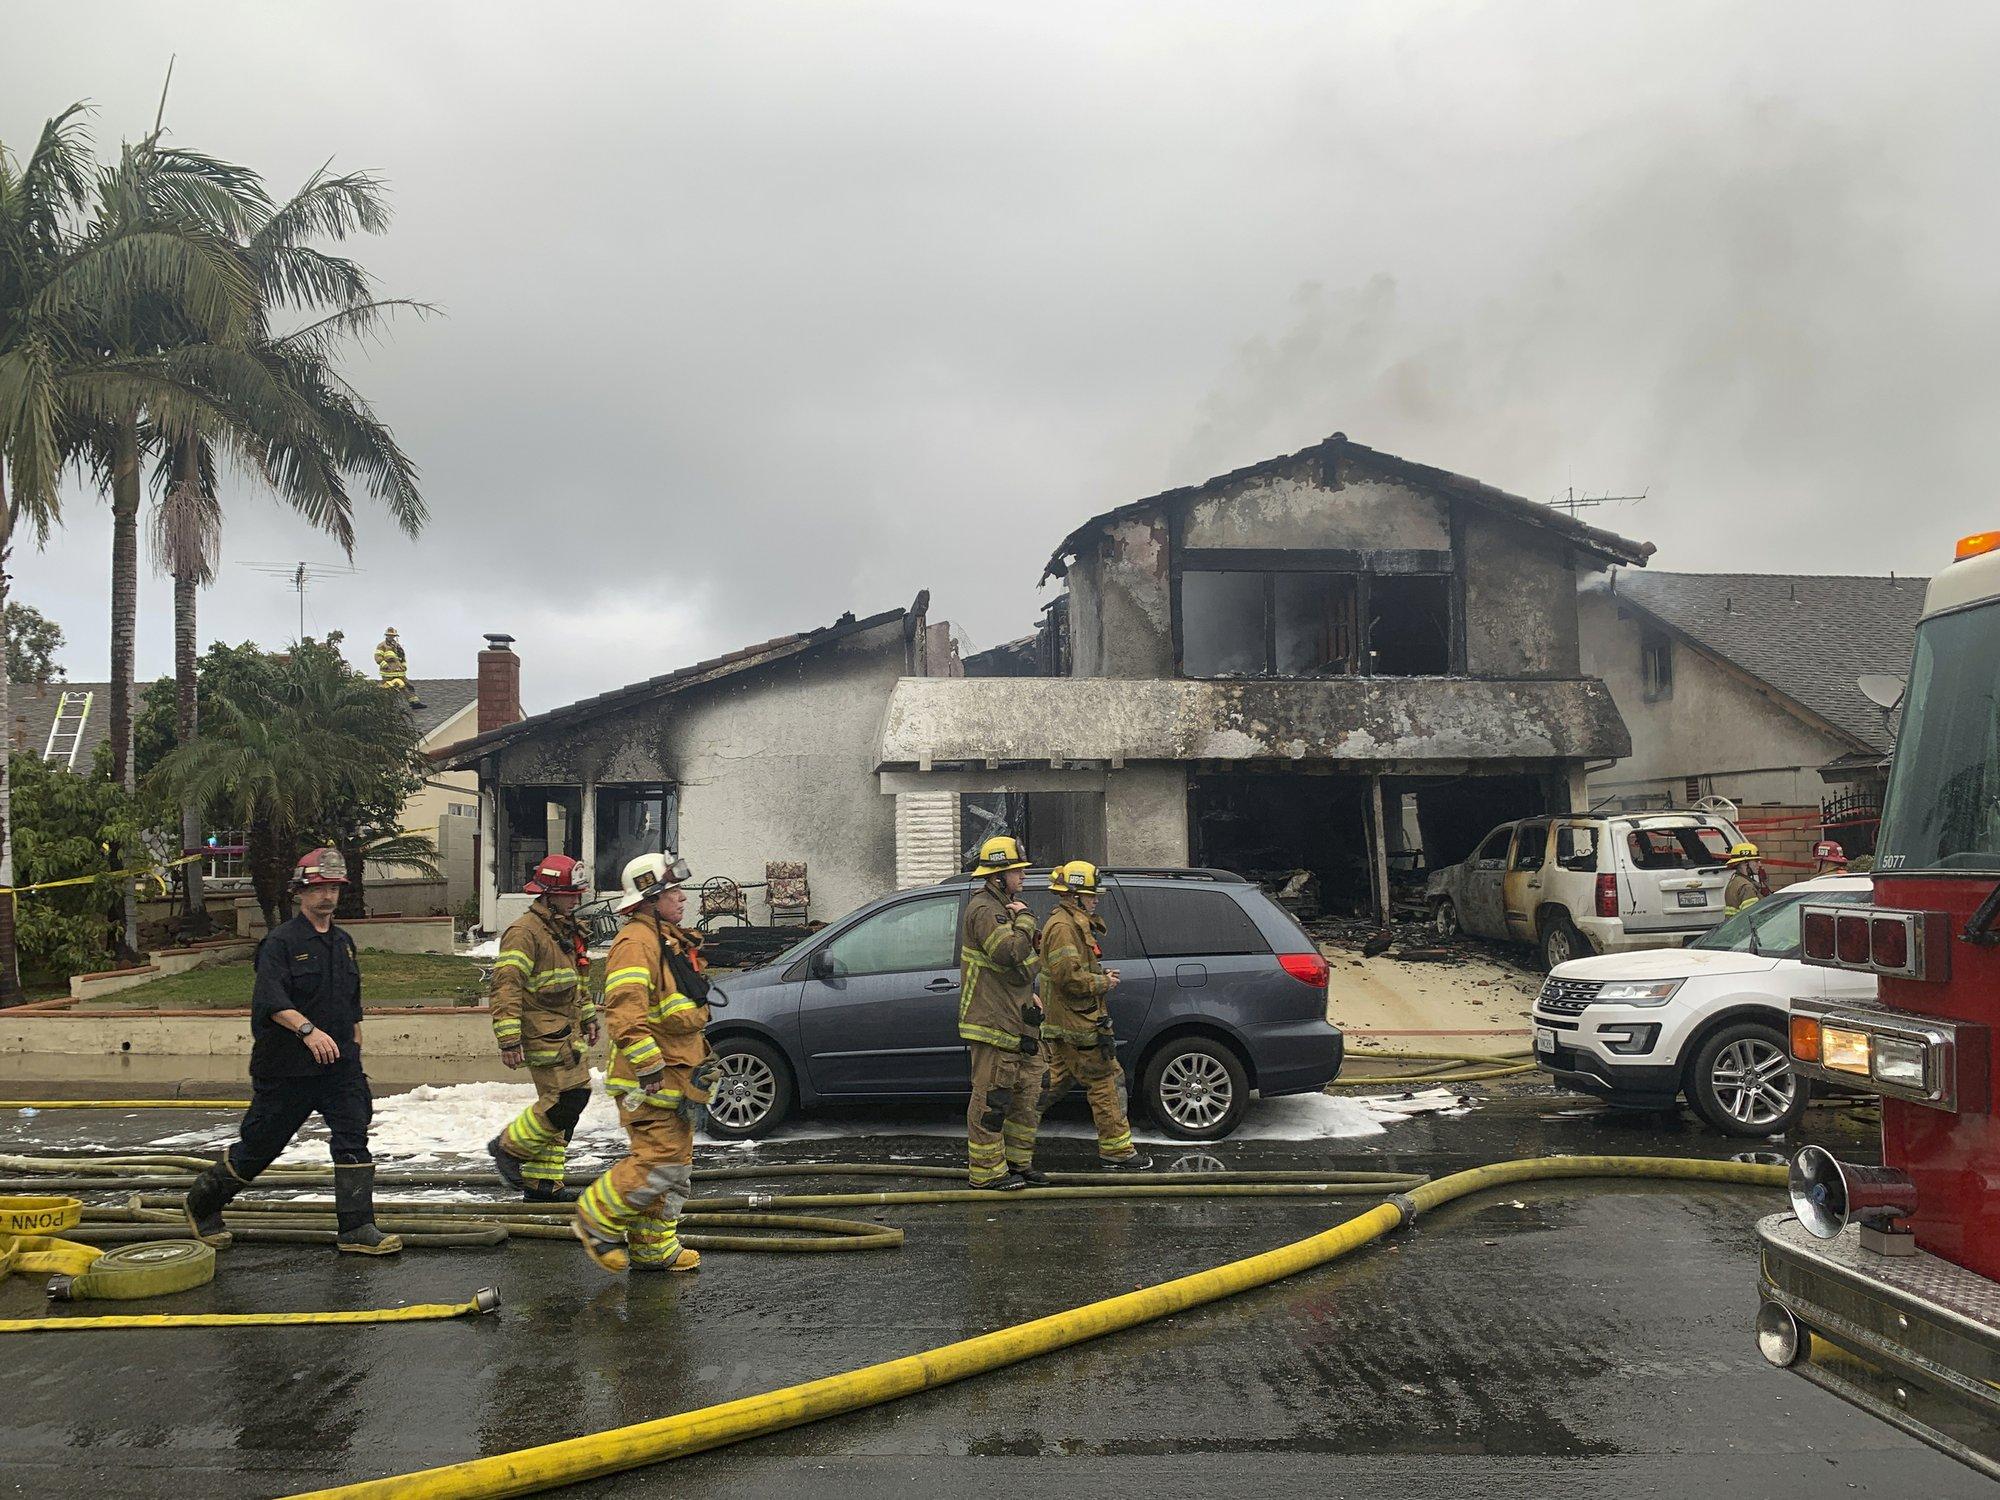 Plane breaks apart over California neighborhood, 5 killed